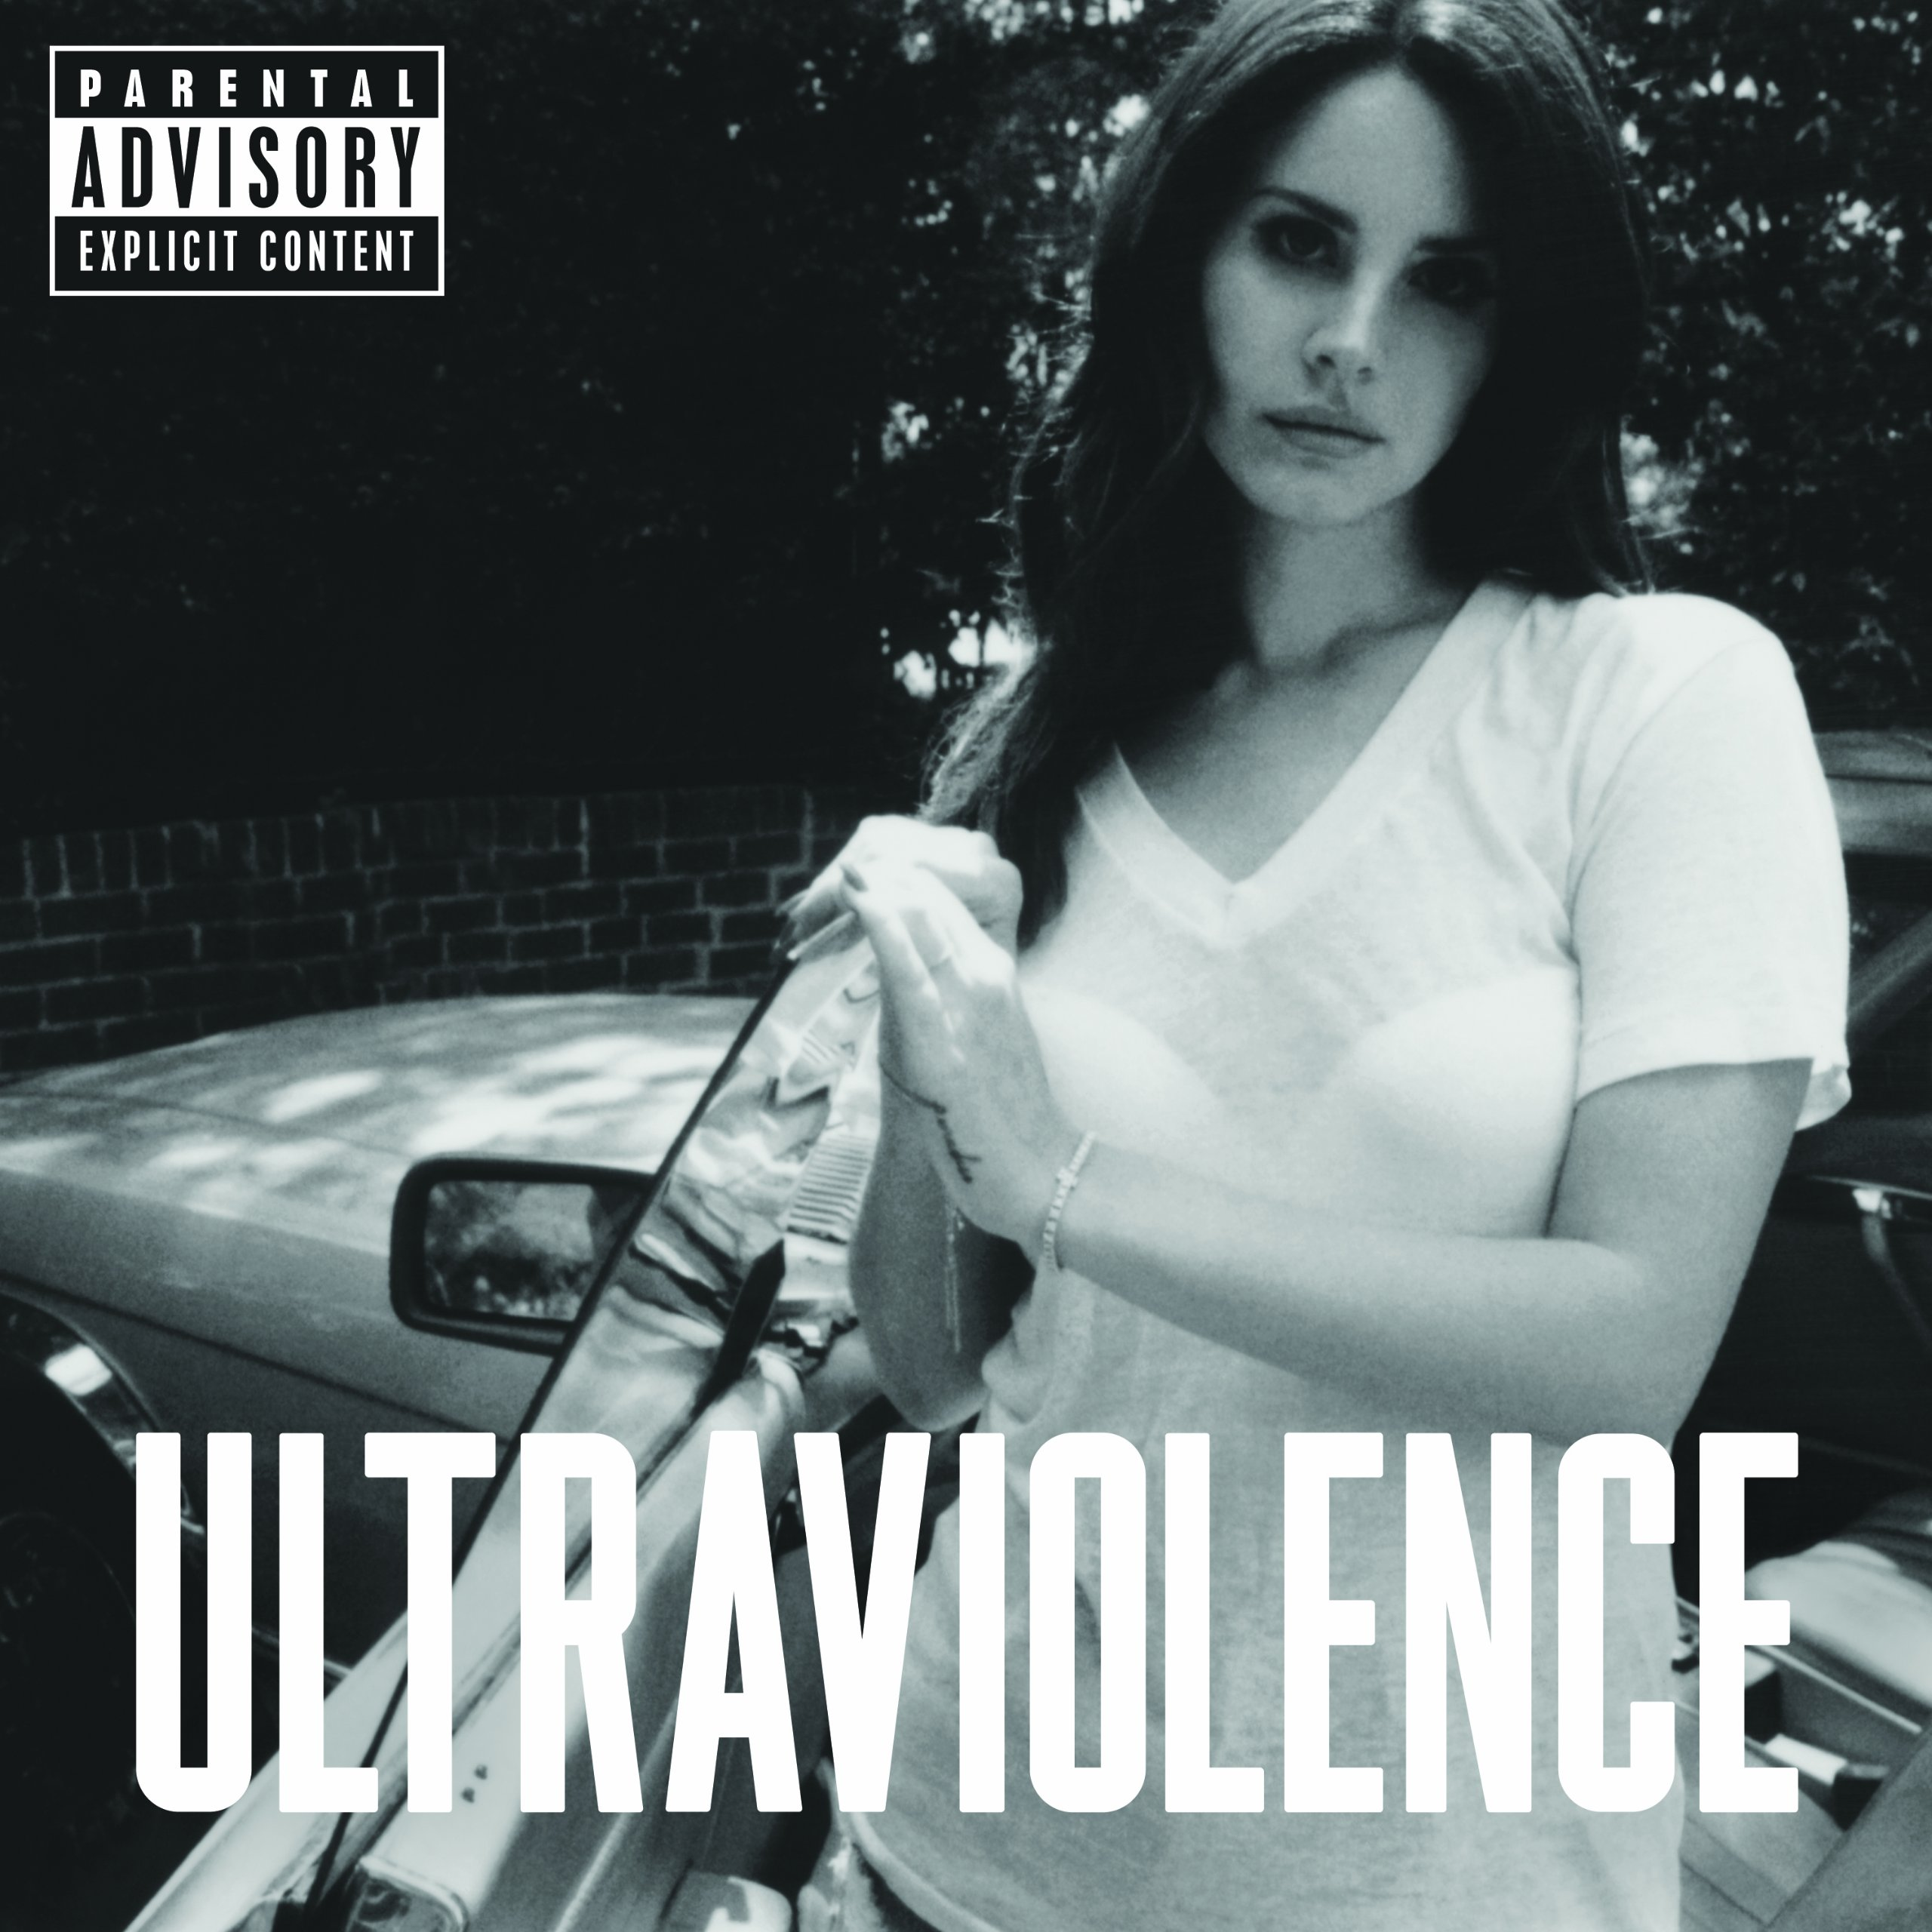 Vinilo : Lana Del Rey - Ultraviolence [Explicit Content] (2 Disc)